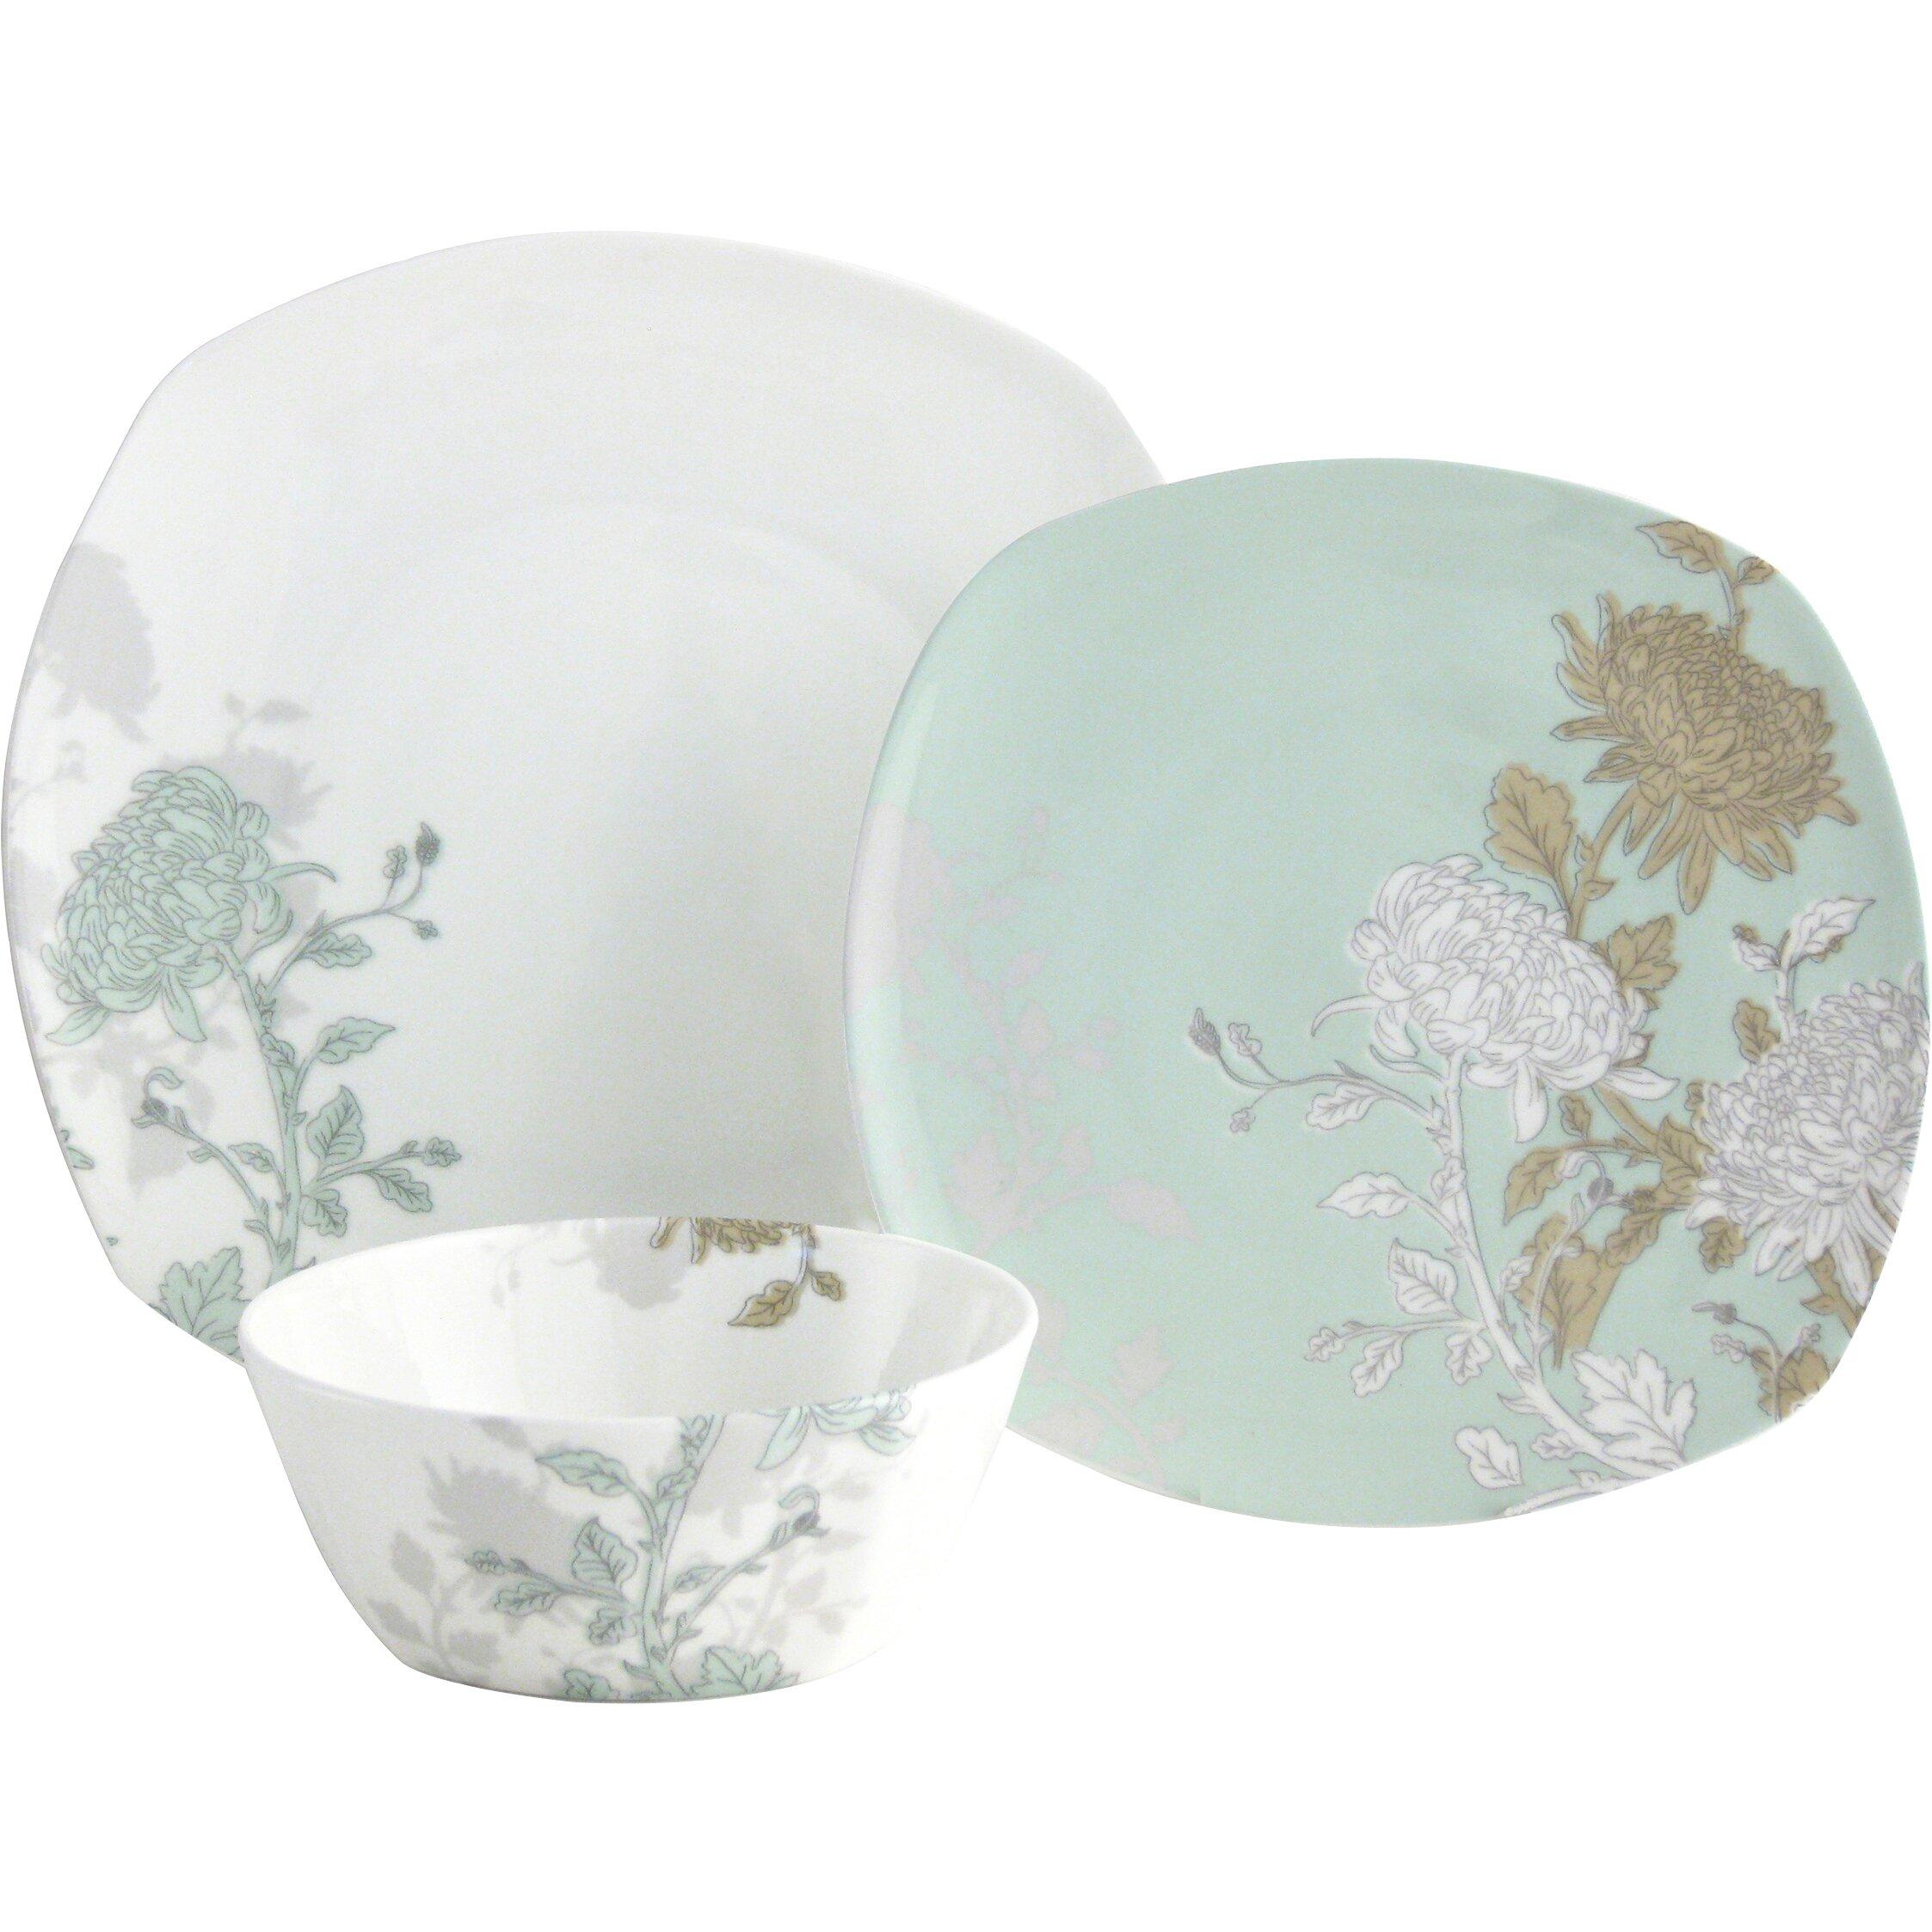 Dining Room 7 Piece Sets Aynsley China Cambridge 12 Piece Porcelain Dinnerware Set